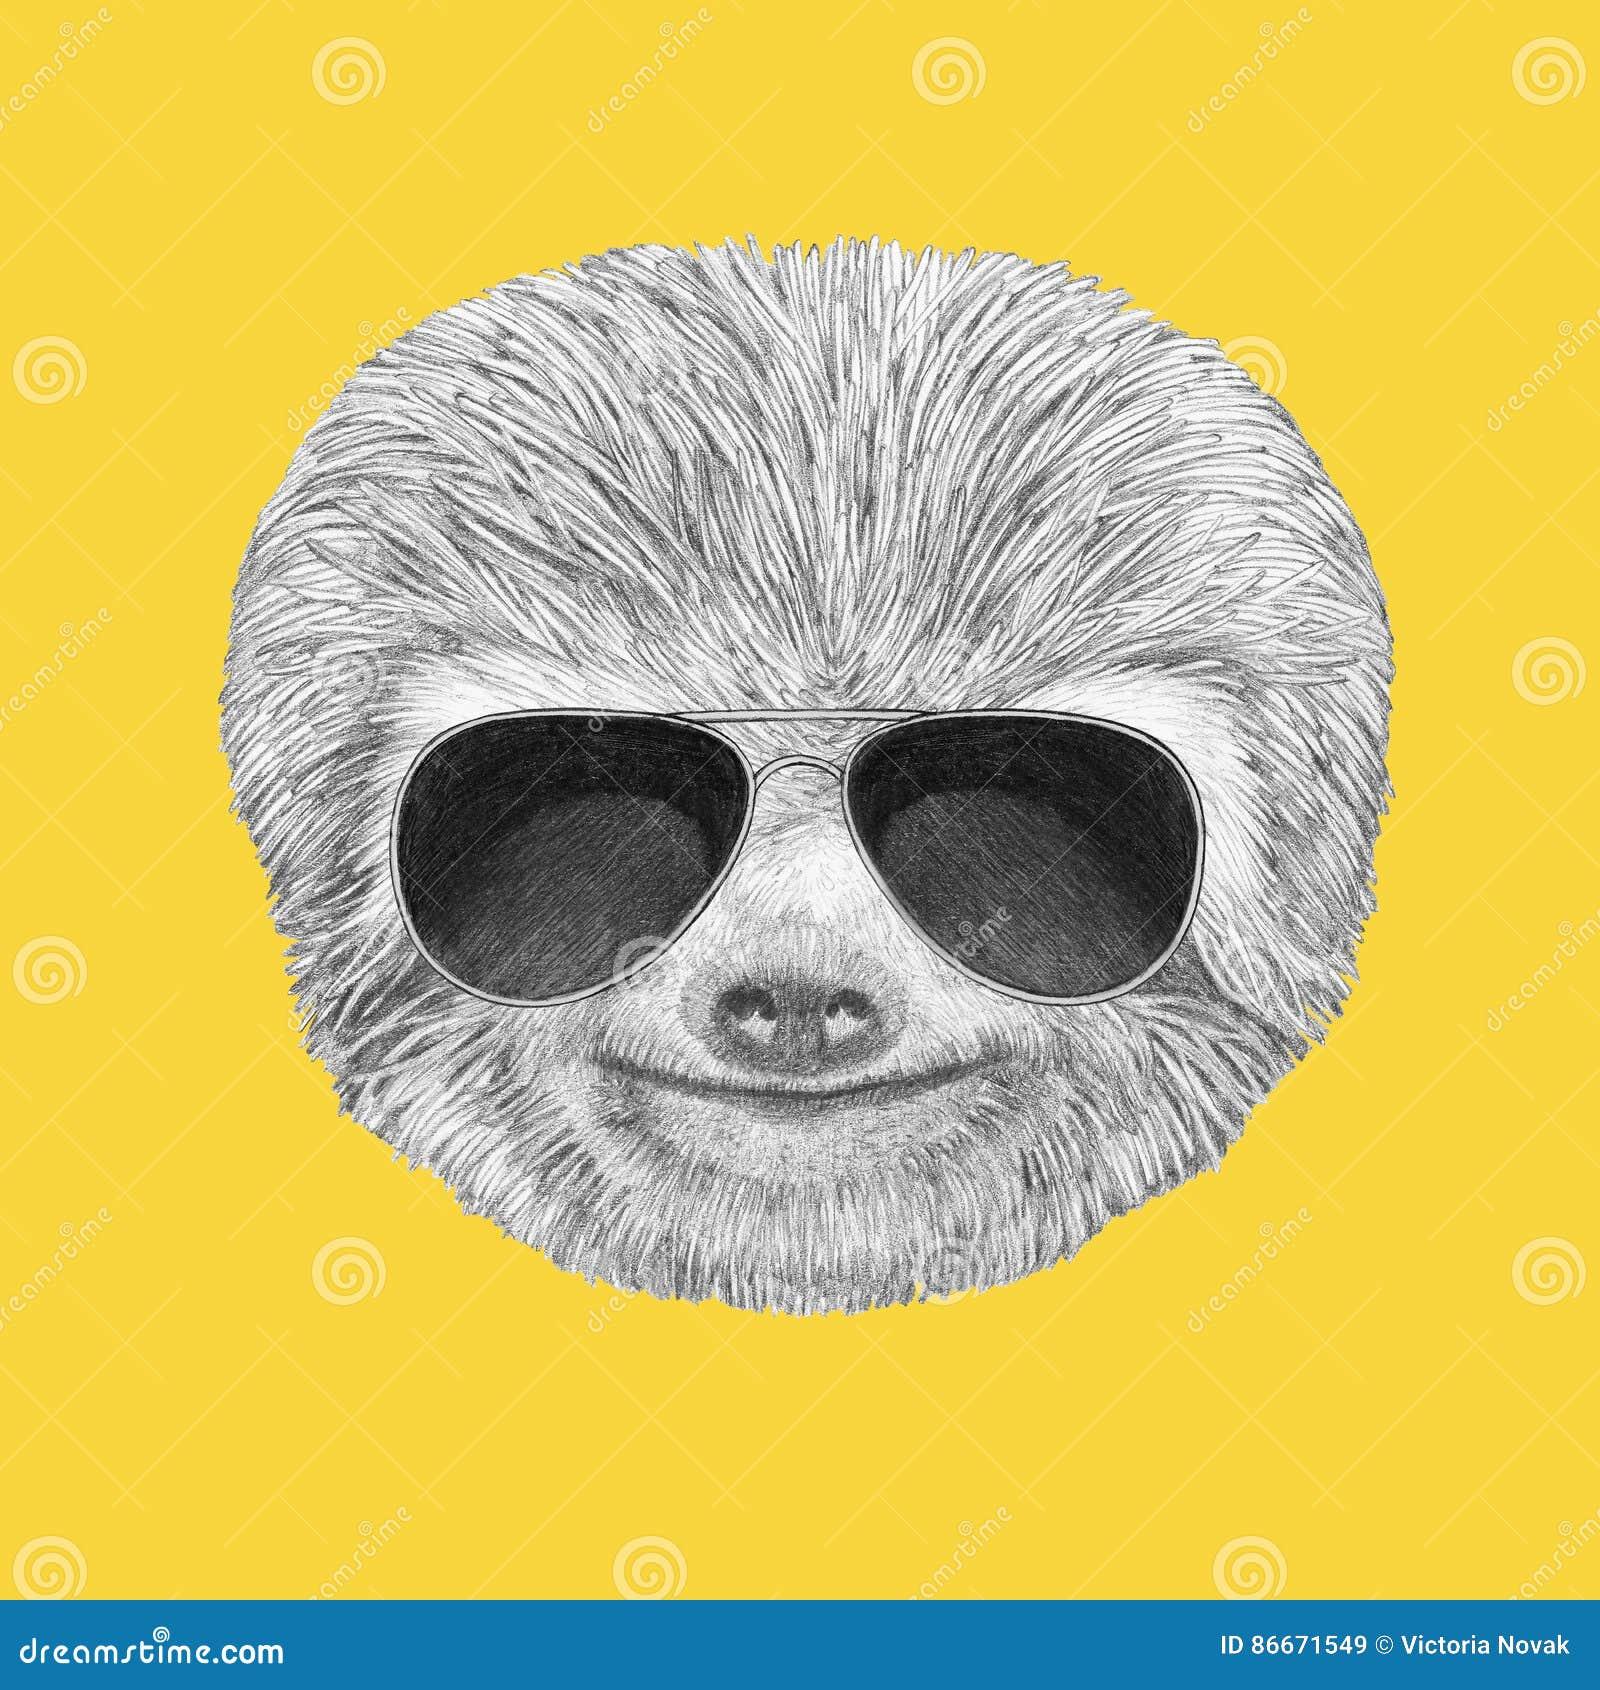 portrait of sloth with sunglasses stock illustration illustration